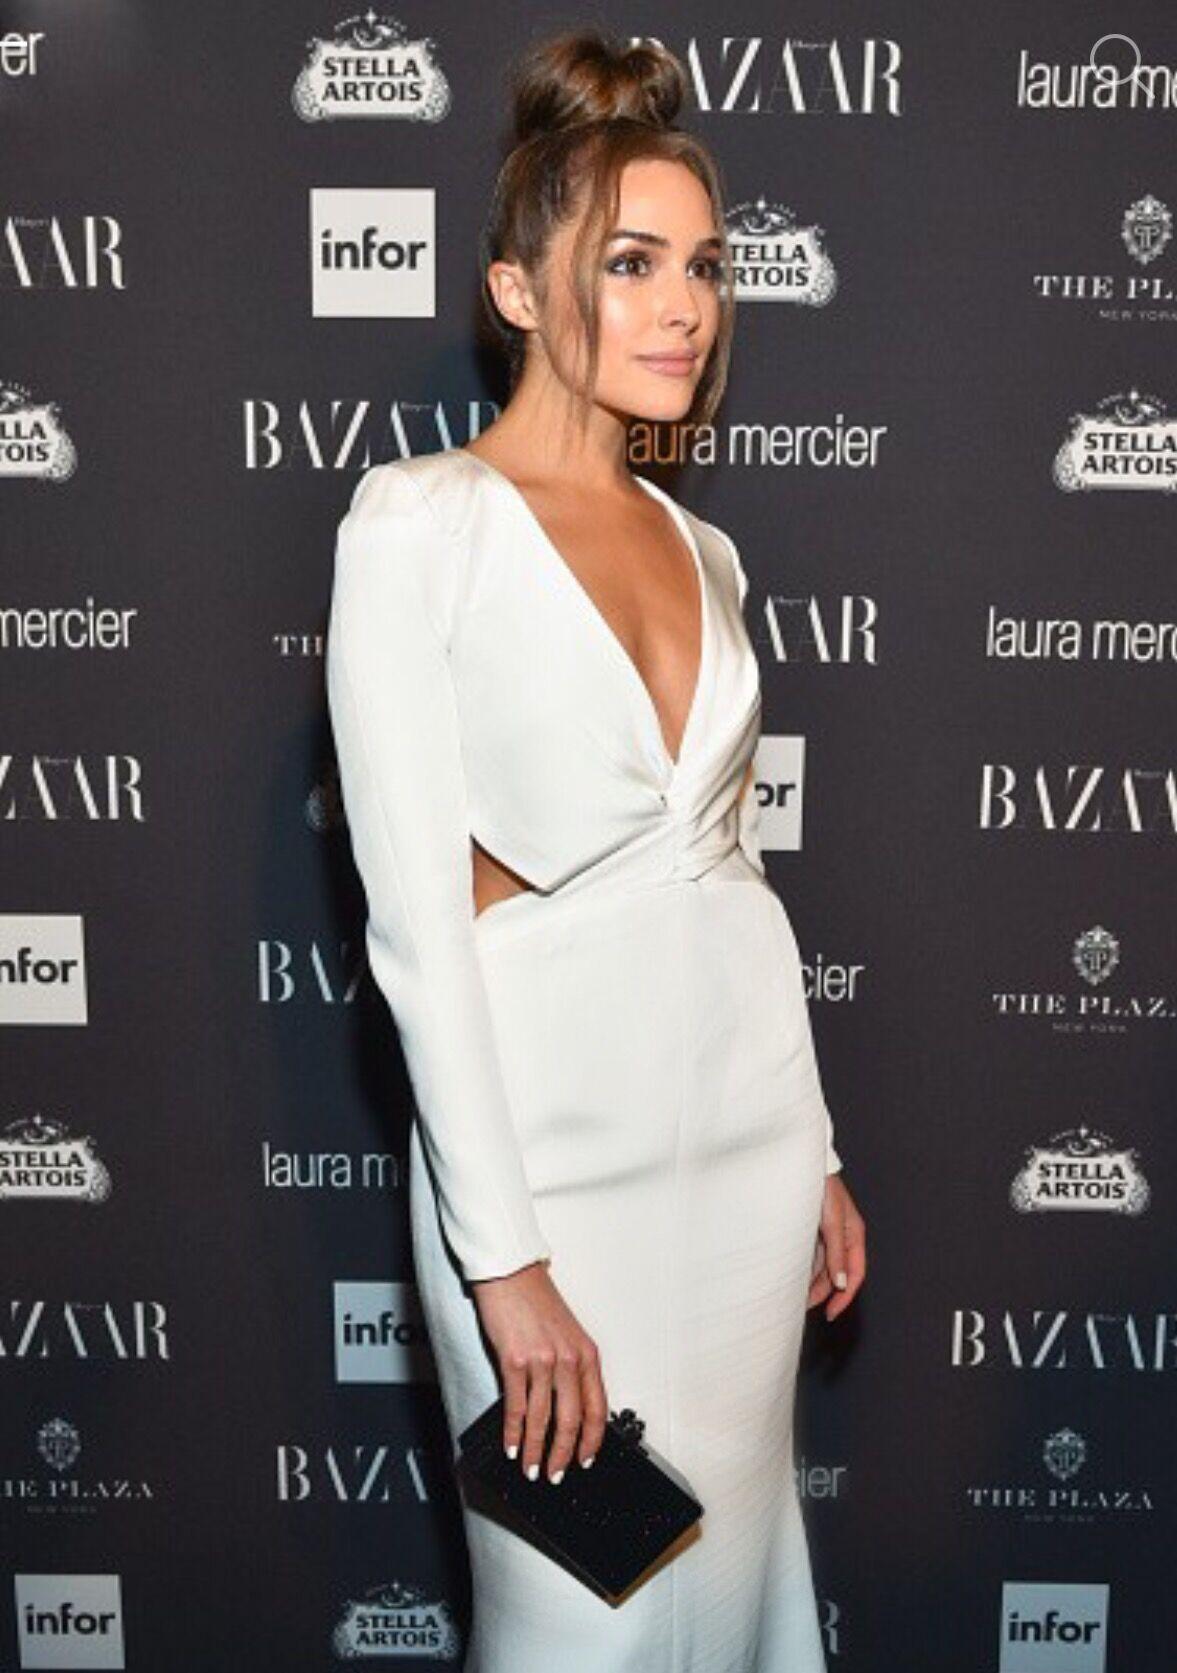 Olivia Culpo Harper's Bazaar Party